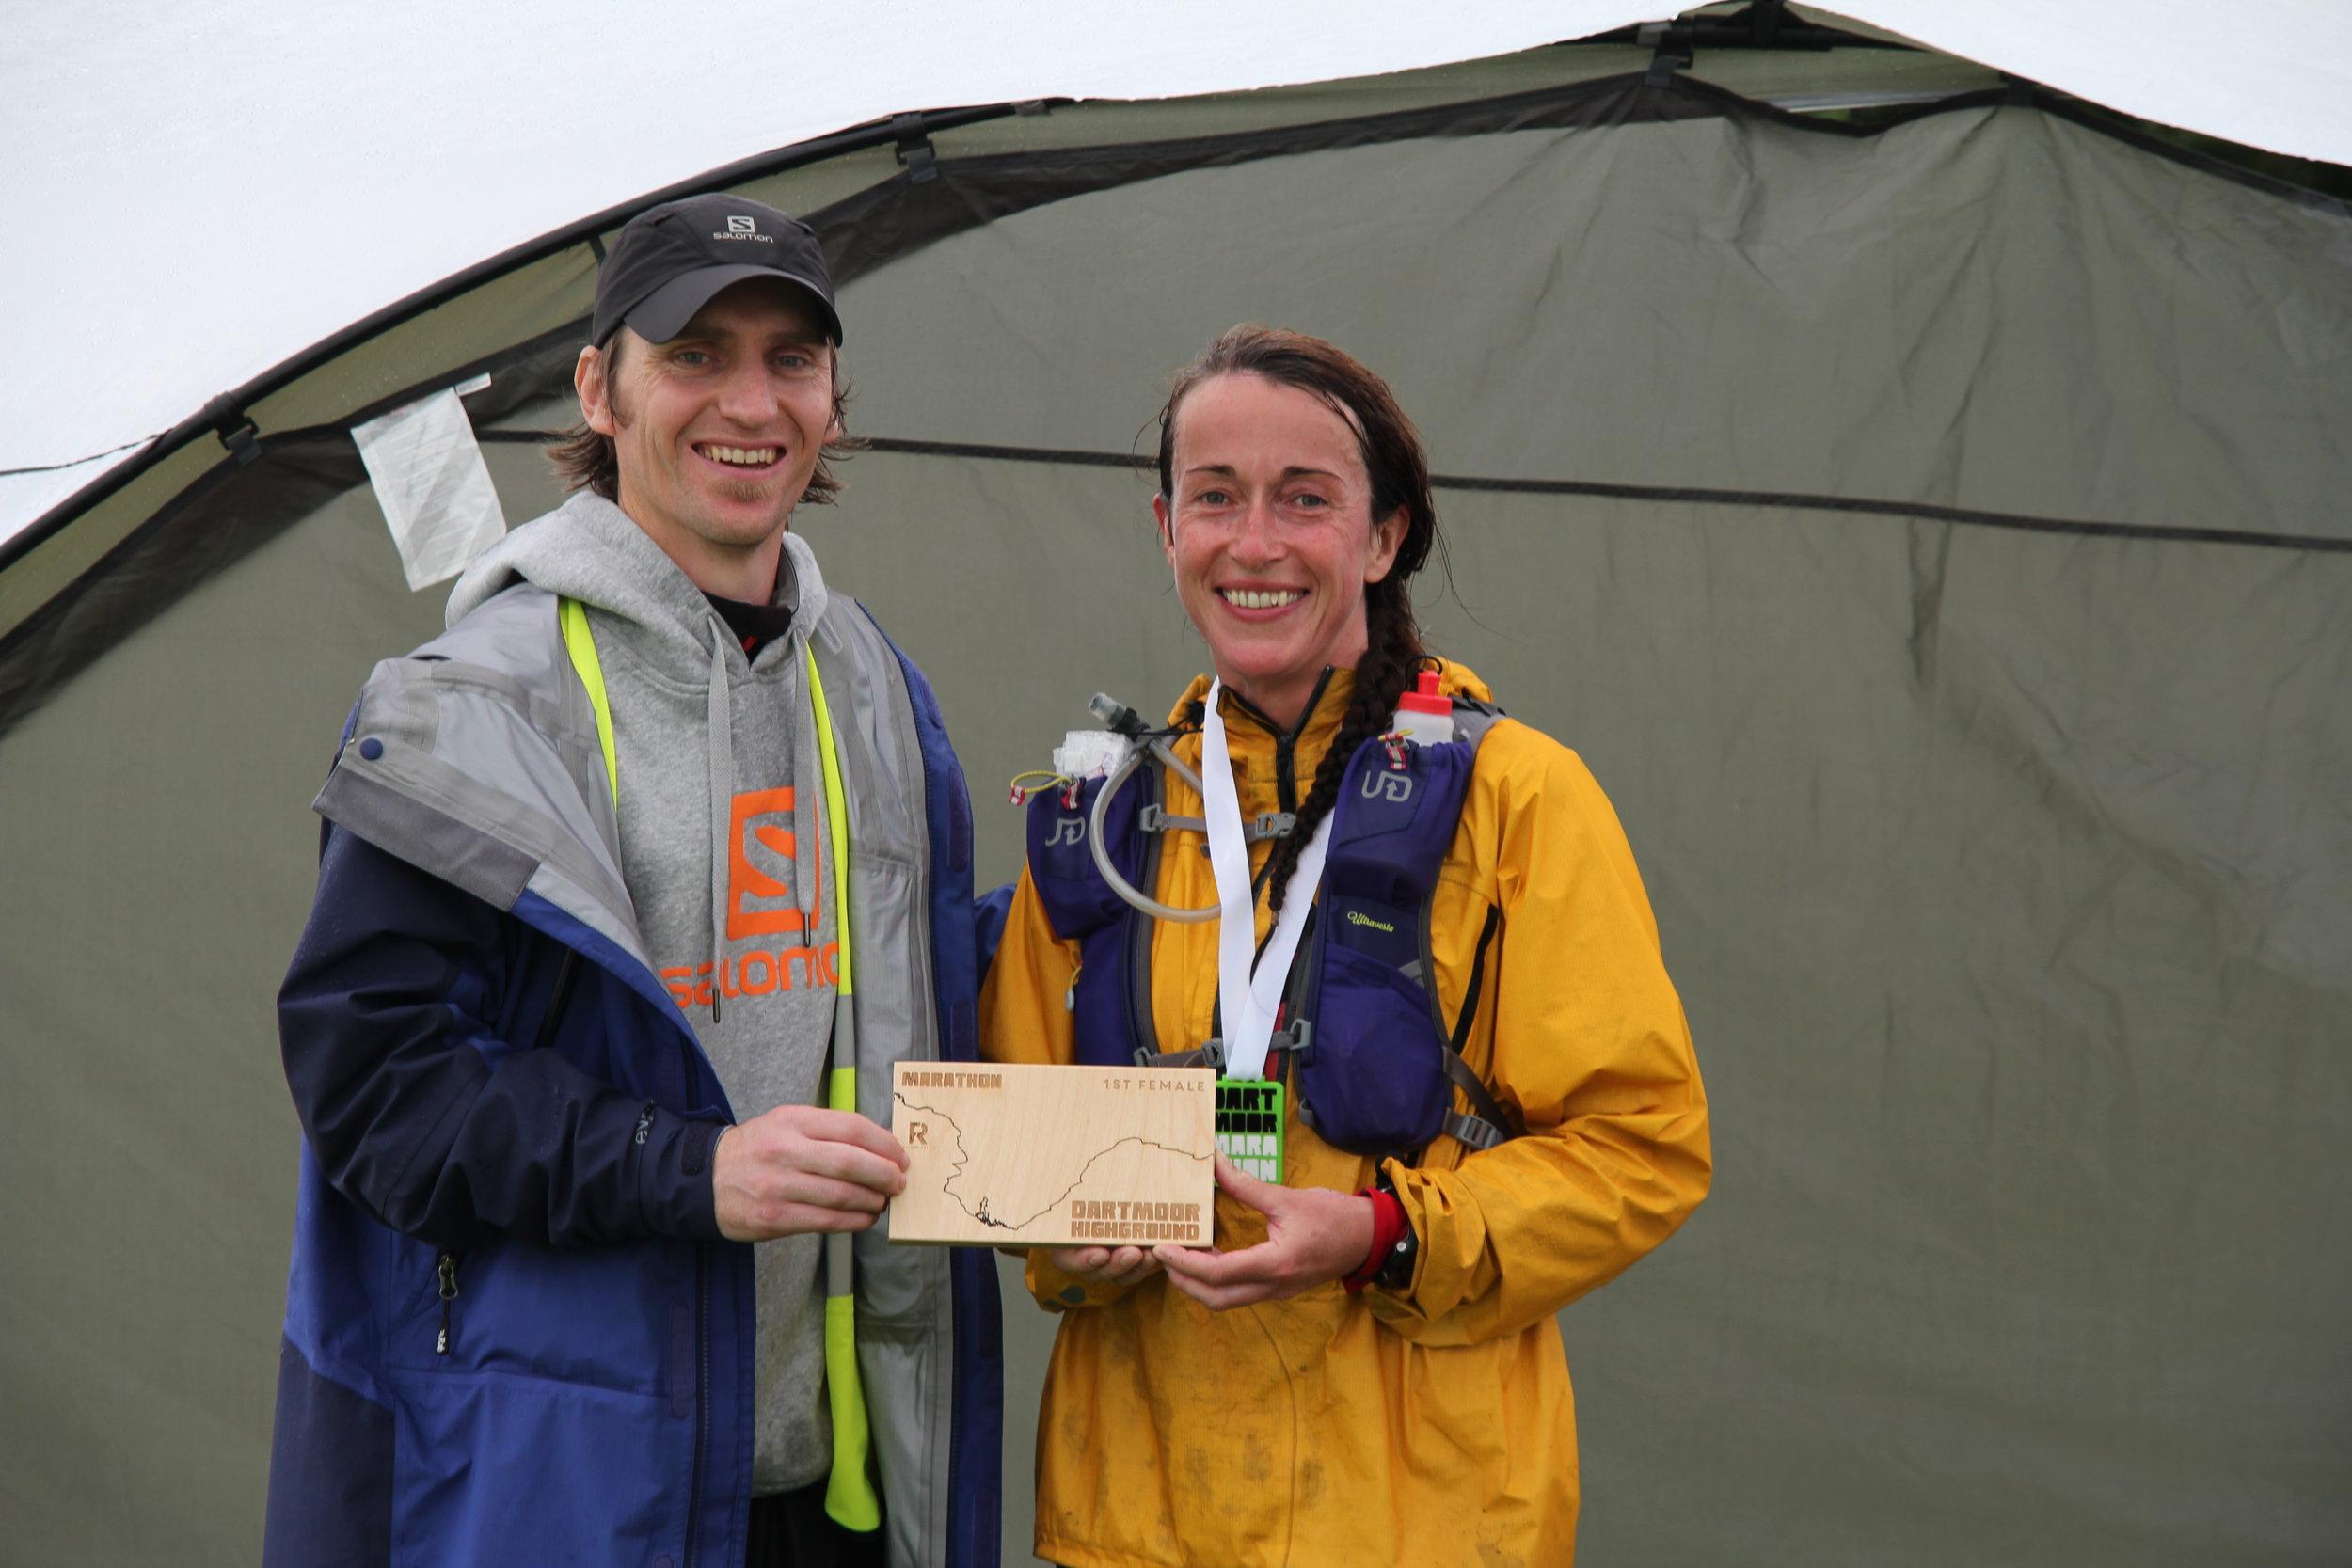 Fun and challenge on Dartmoor